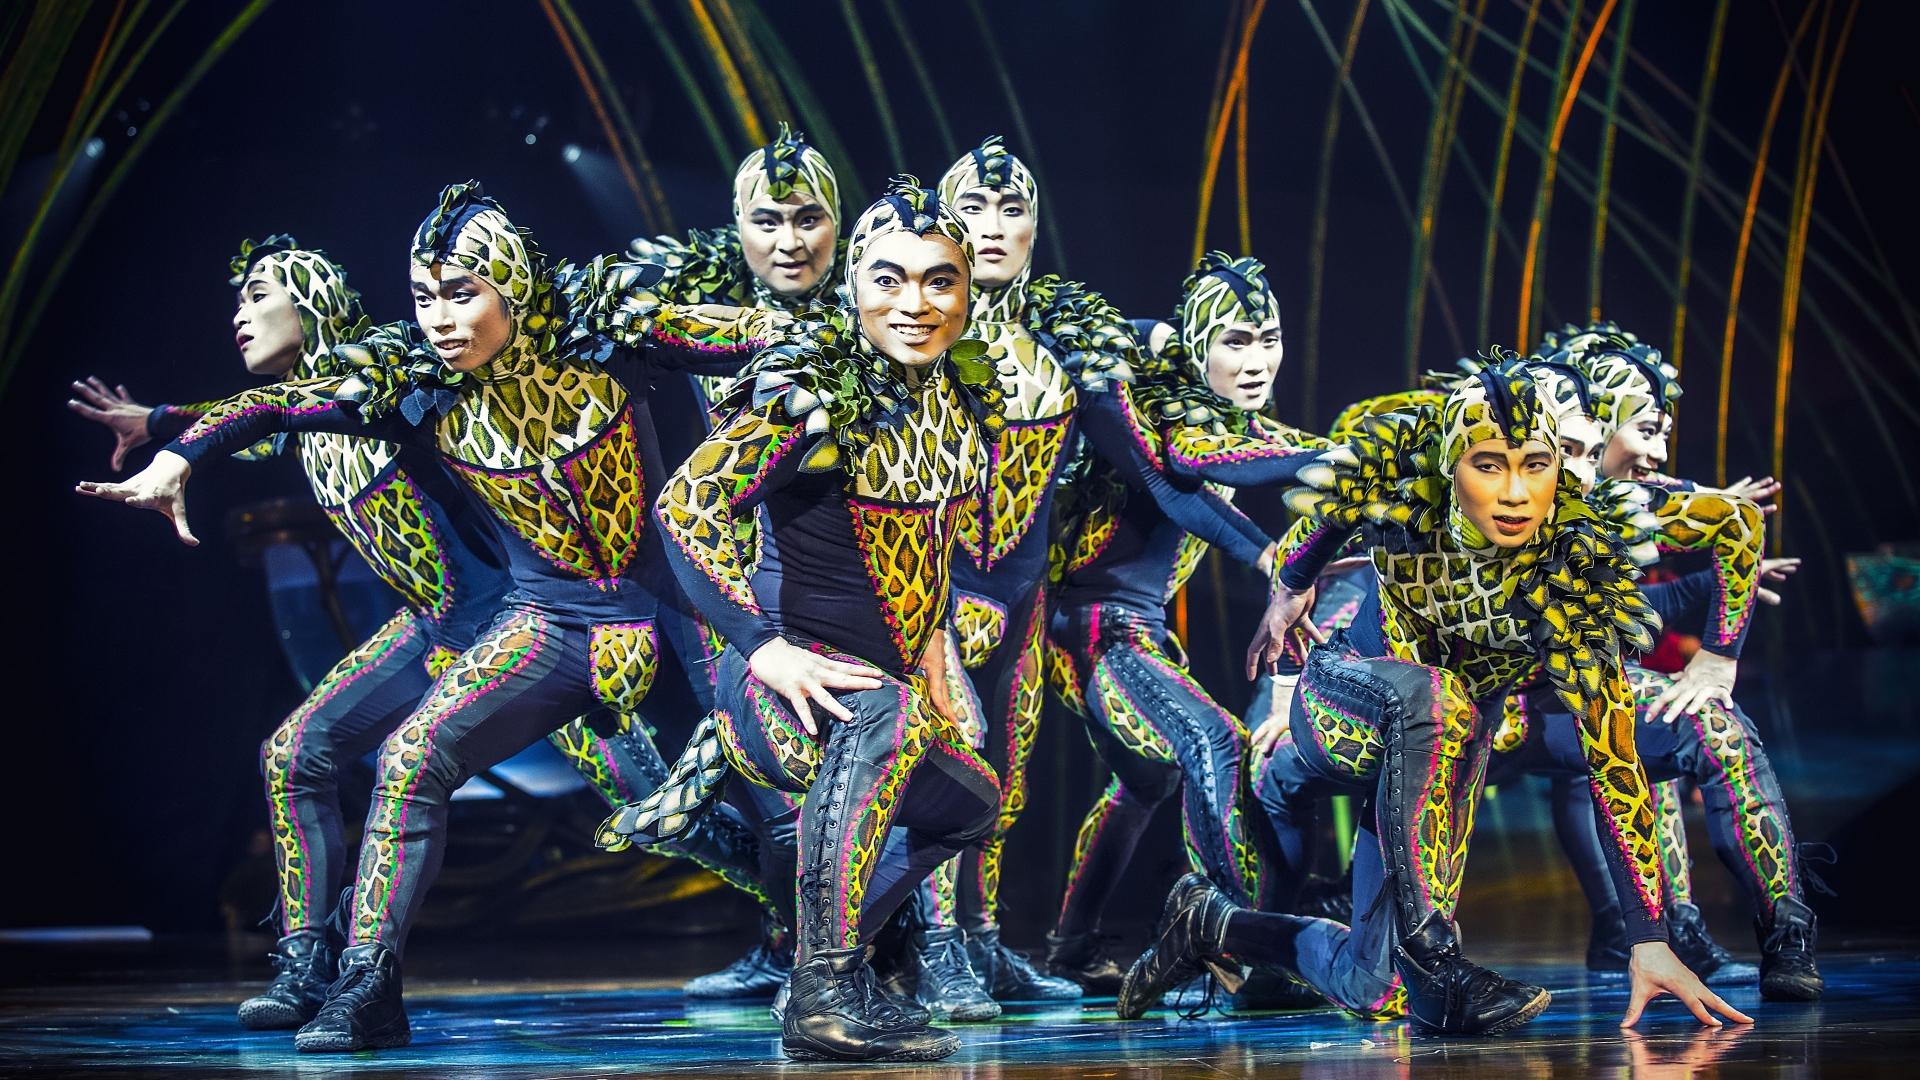 Cirque du Soleil alista su llegada a Arabia Saudita